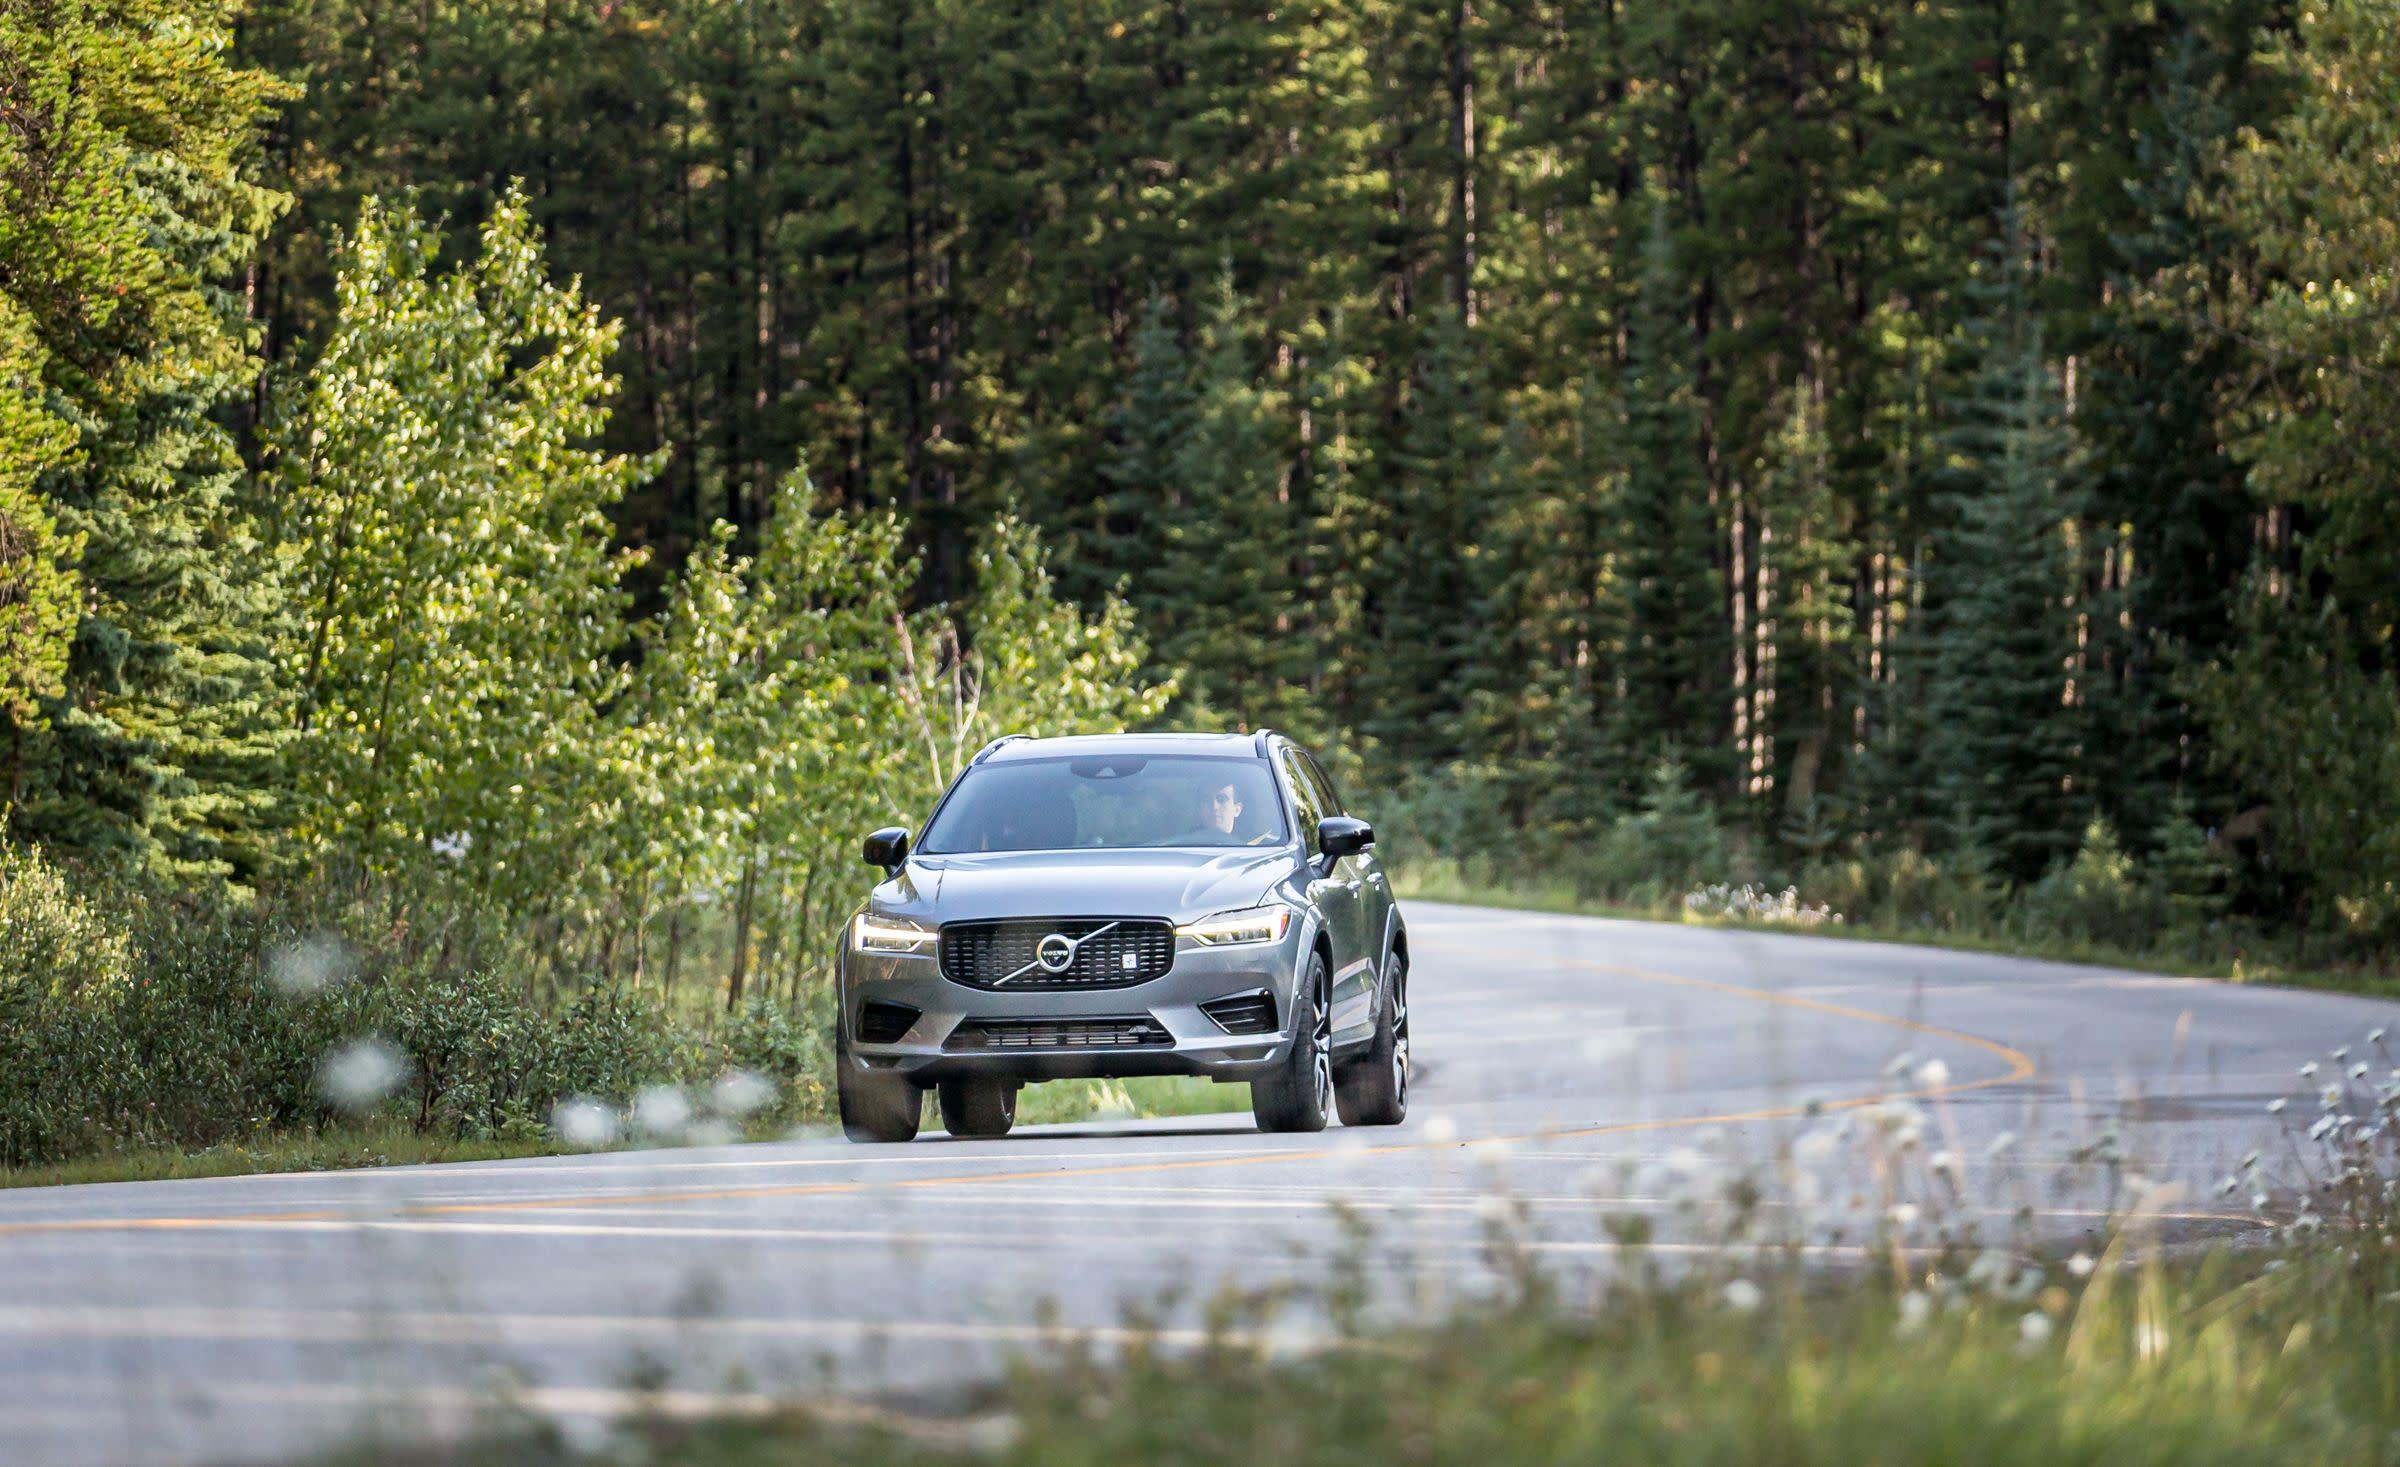 View Photos of the 2020 Volvo XC60 Polestar